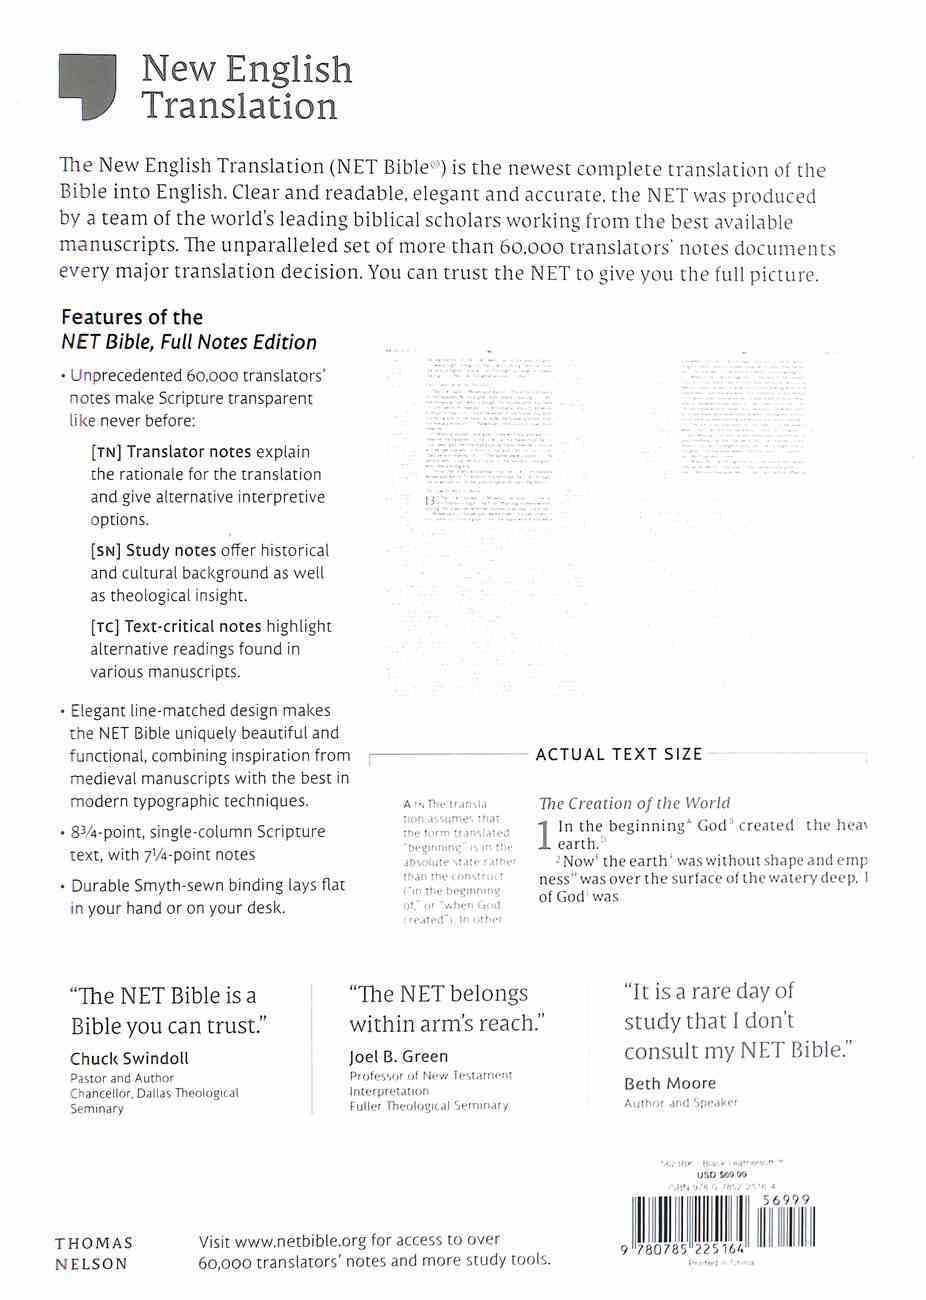 NET Bible Full-Notes Edition Black Premium Imitation Leather